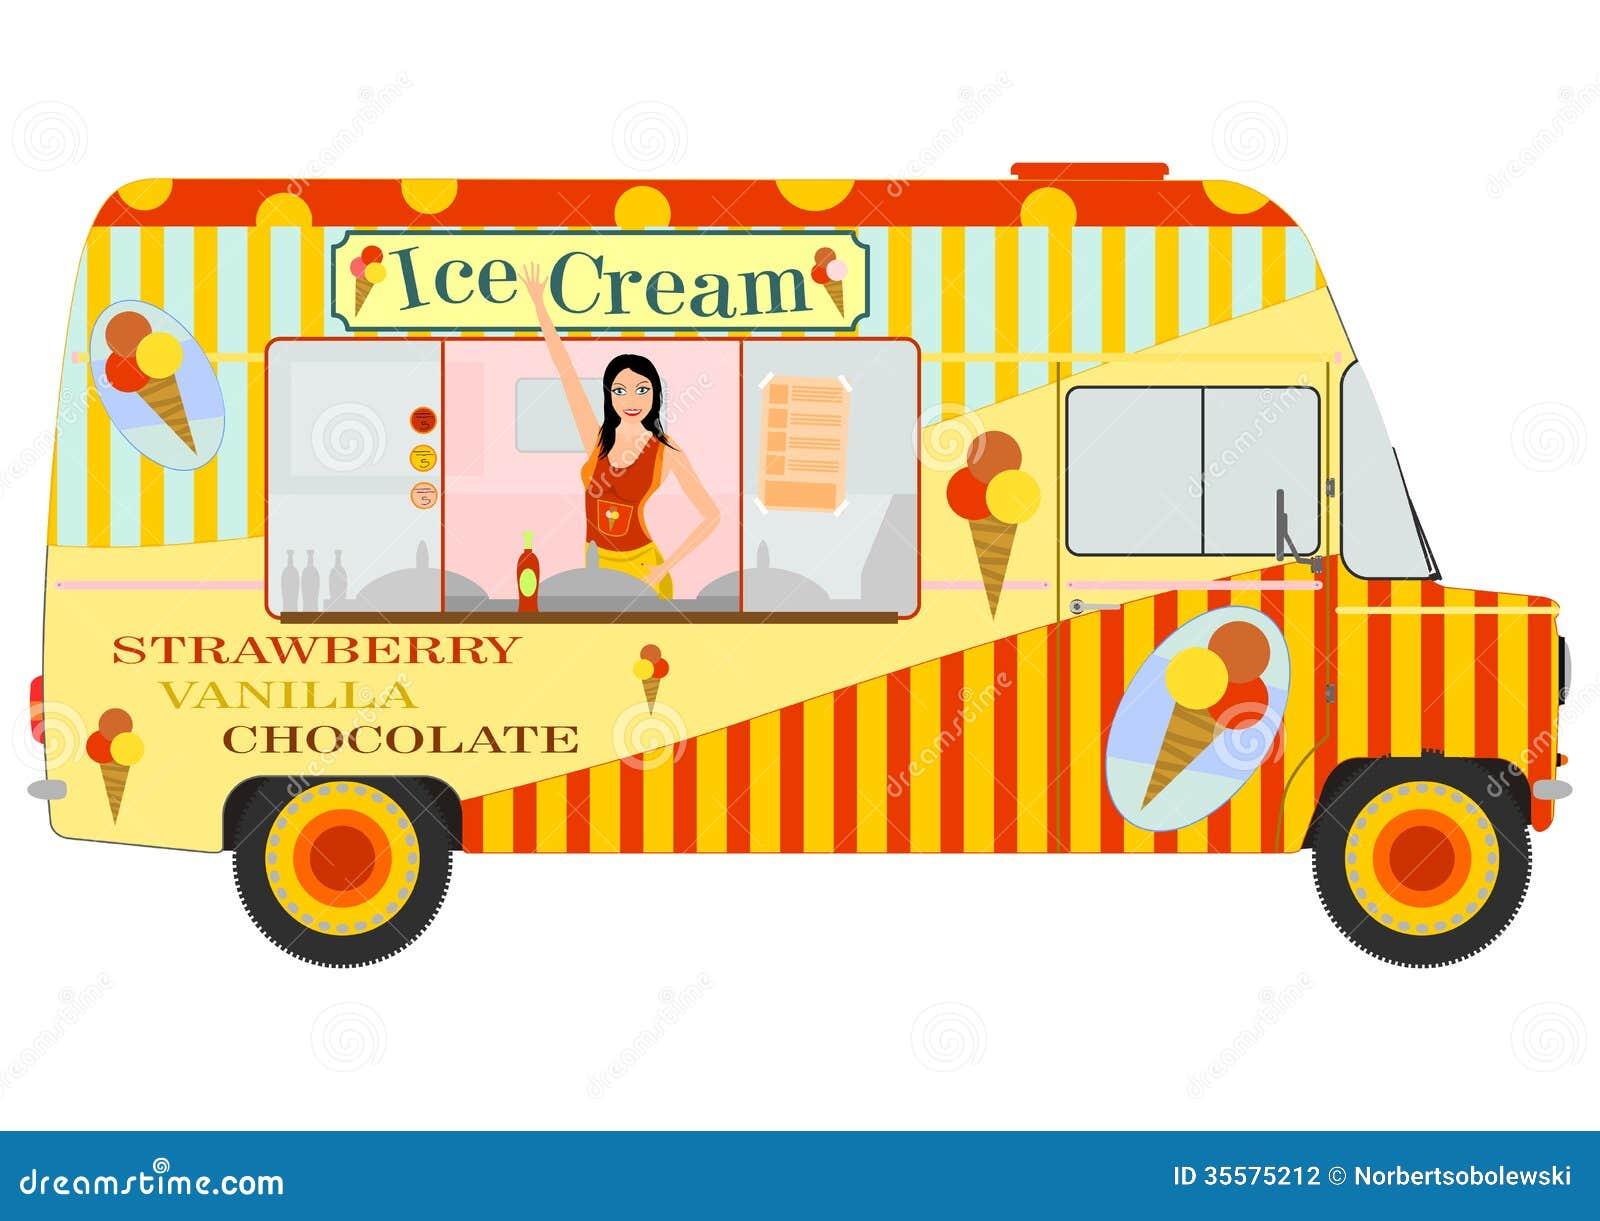 Ice Cream Van With Girl Inside Stock Photography Image 35575212